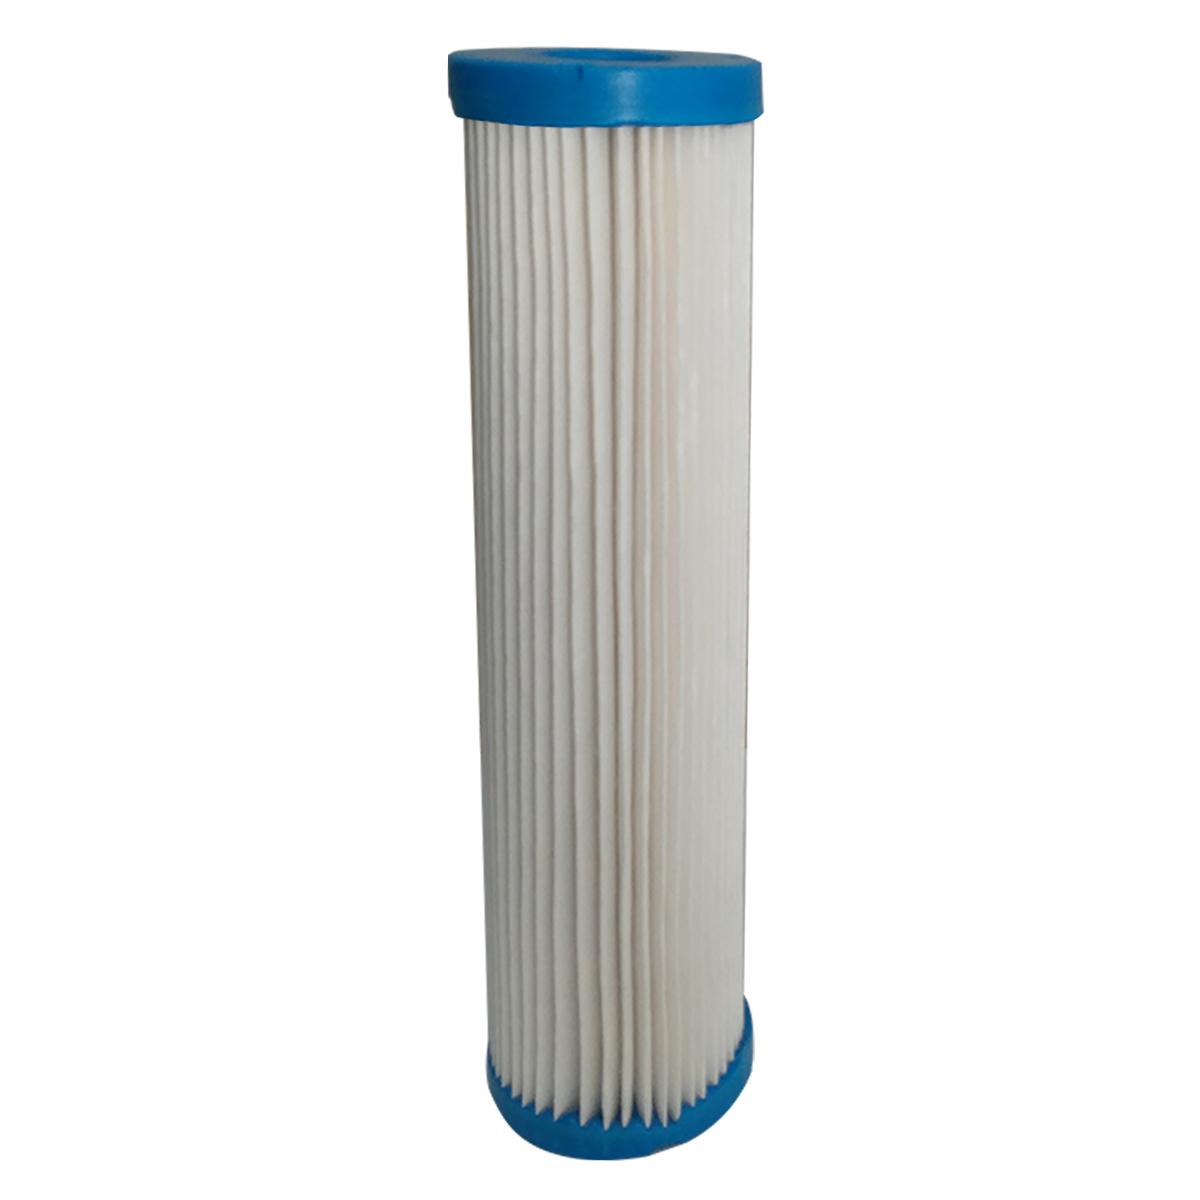 Refil Filtro Plissado Lavável 9 3/4'' 5 Micra